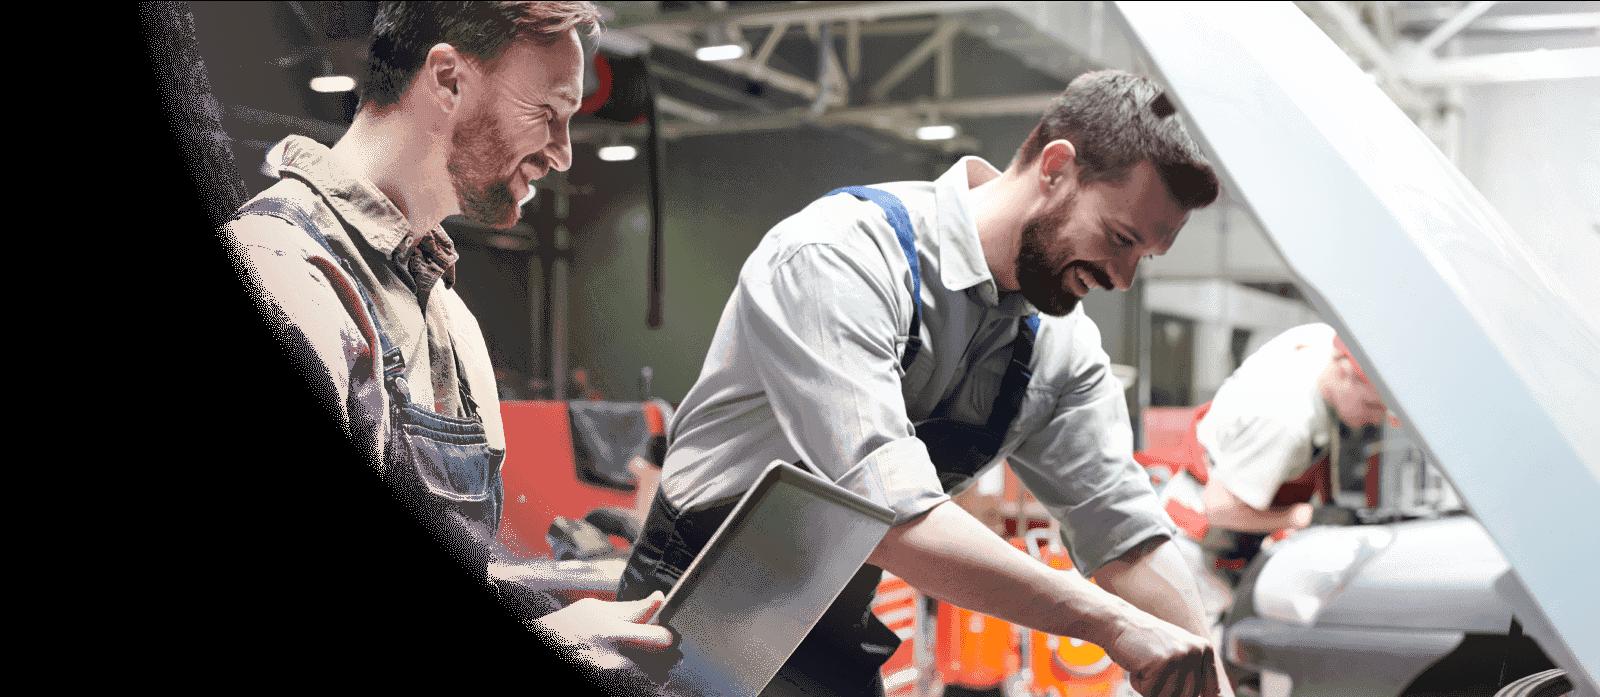 smiling men working on car engine